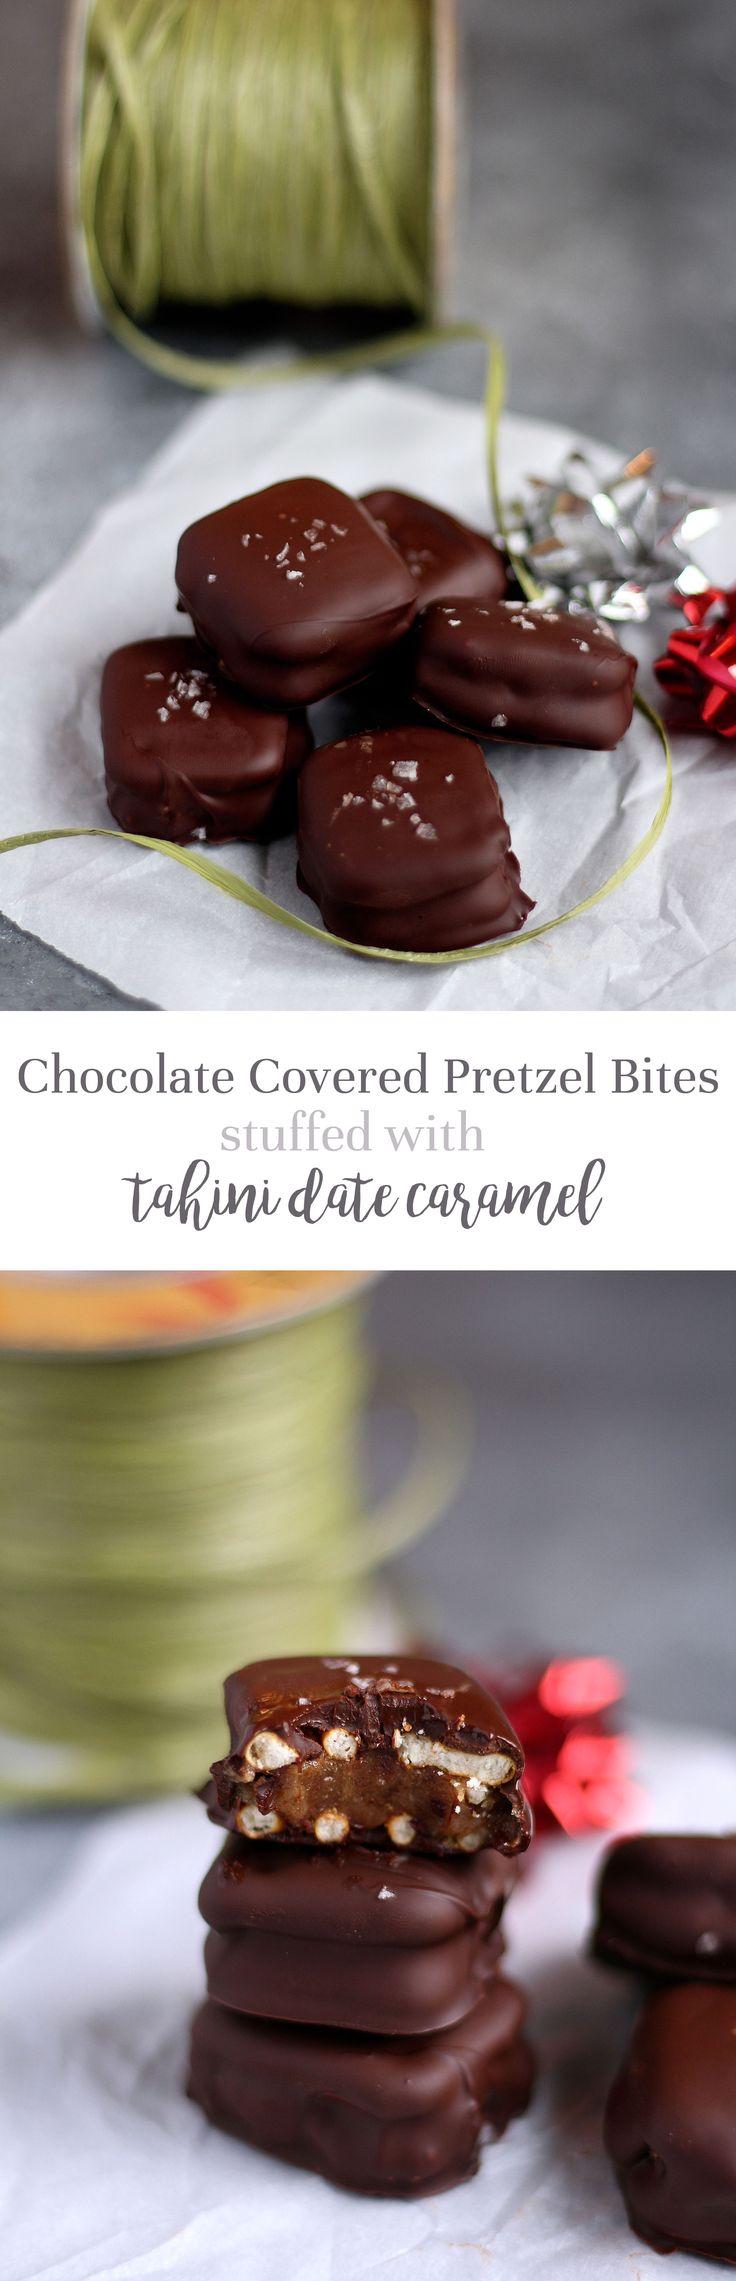 Dark chocolate covered pretzel bites stuffed with tahini date caramel (vegan)